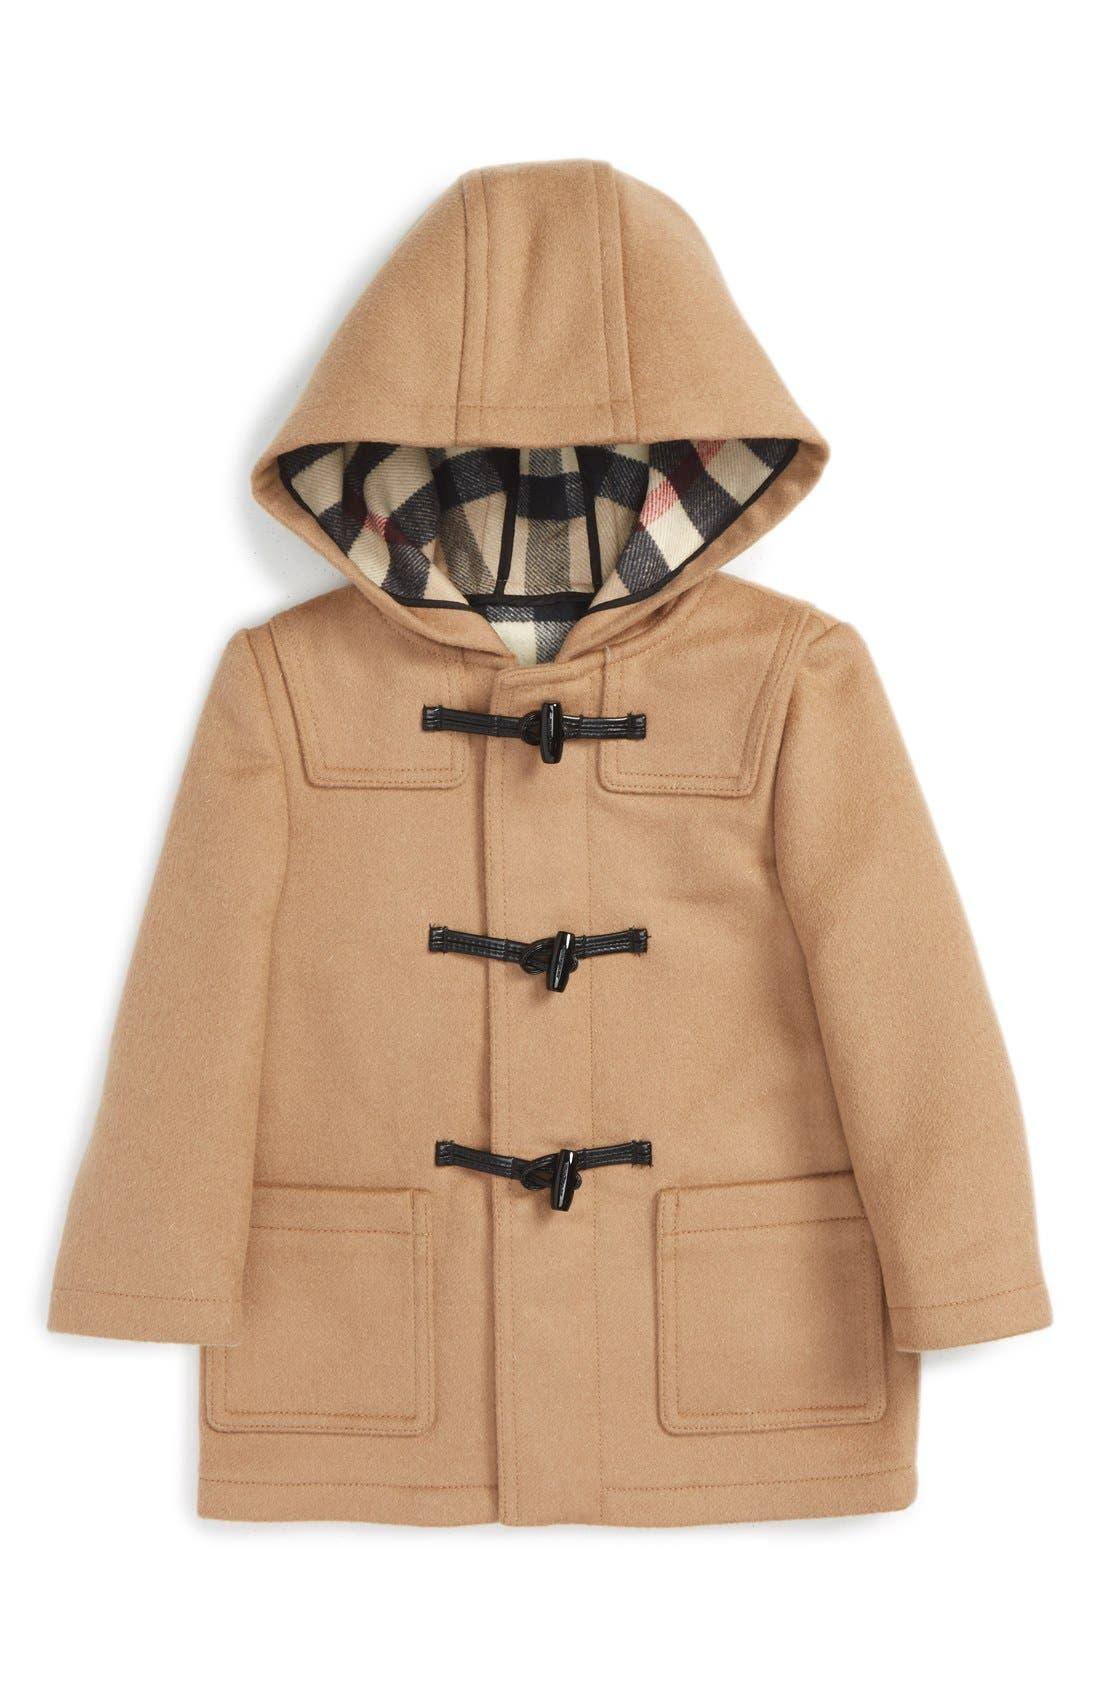 Burberry 'Brogan' Hooded Wool Toggle Coat (Toddler Boys)